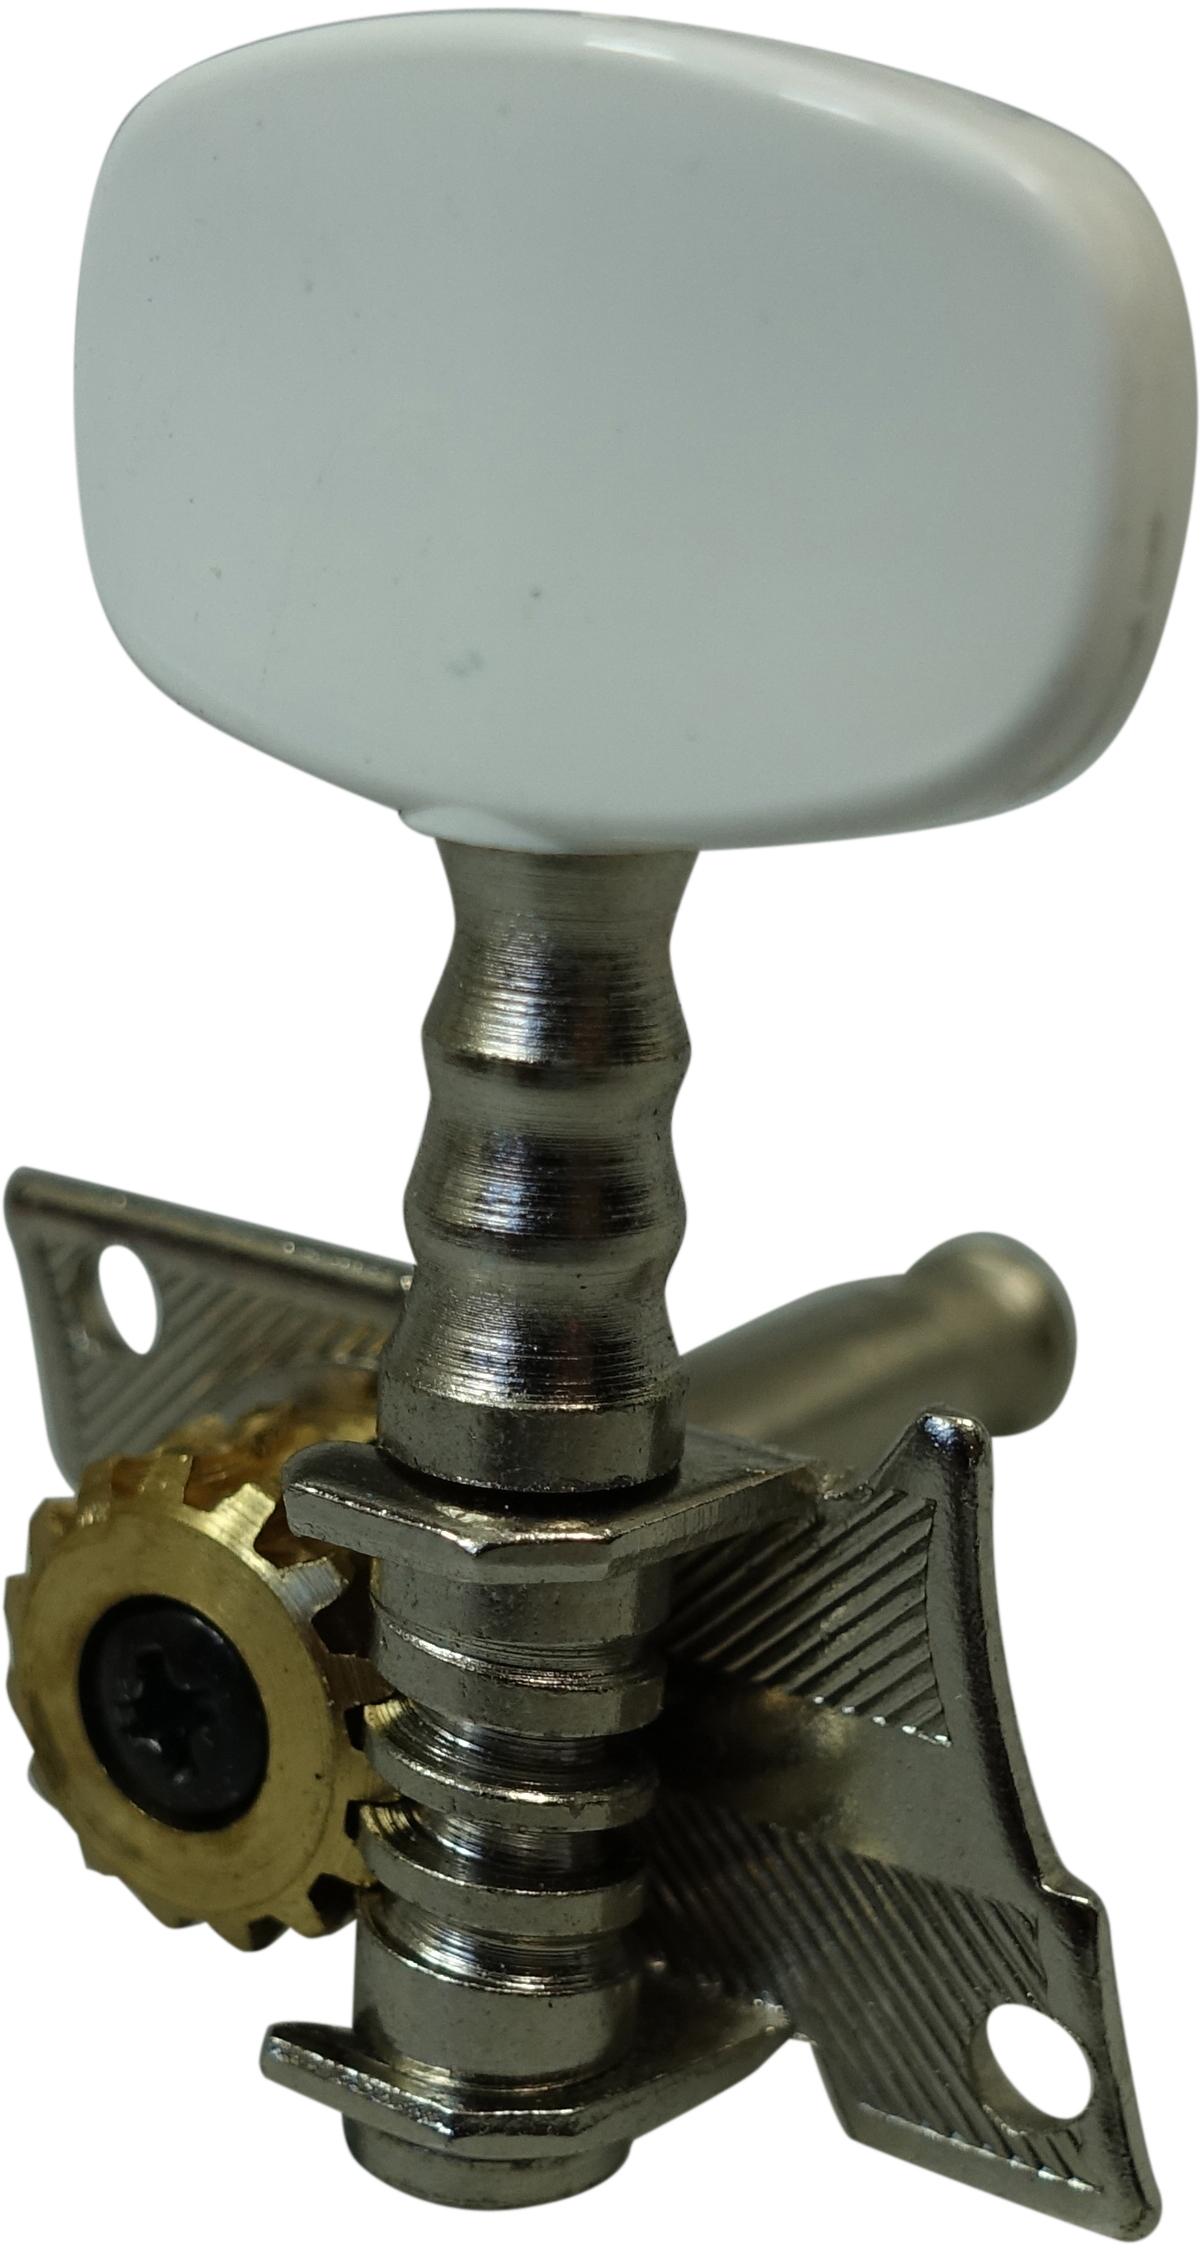 Toronzo Machine heads GPC-3L3R-PL-Nickel